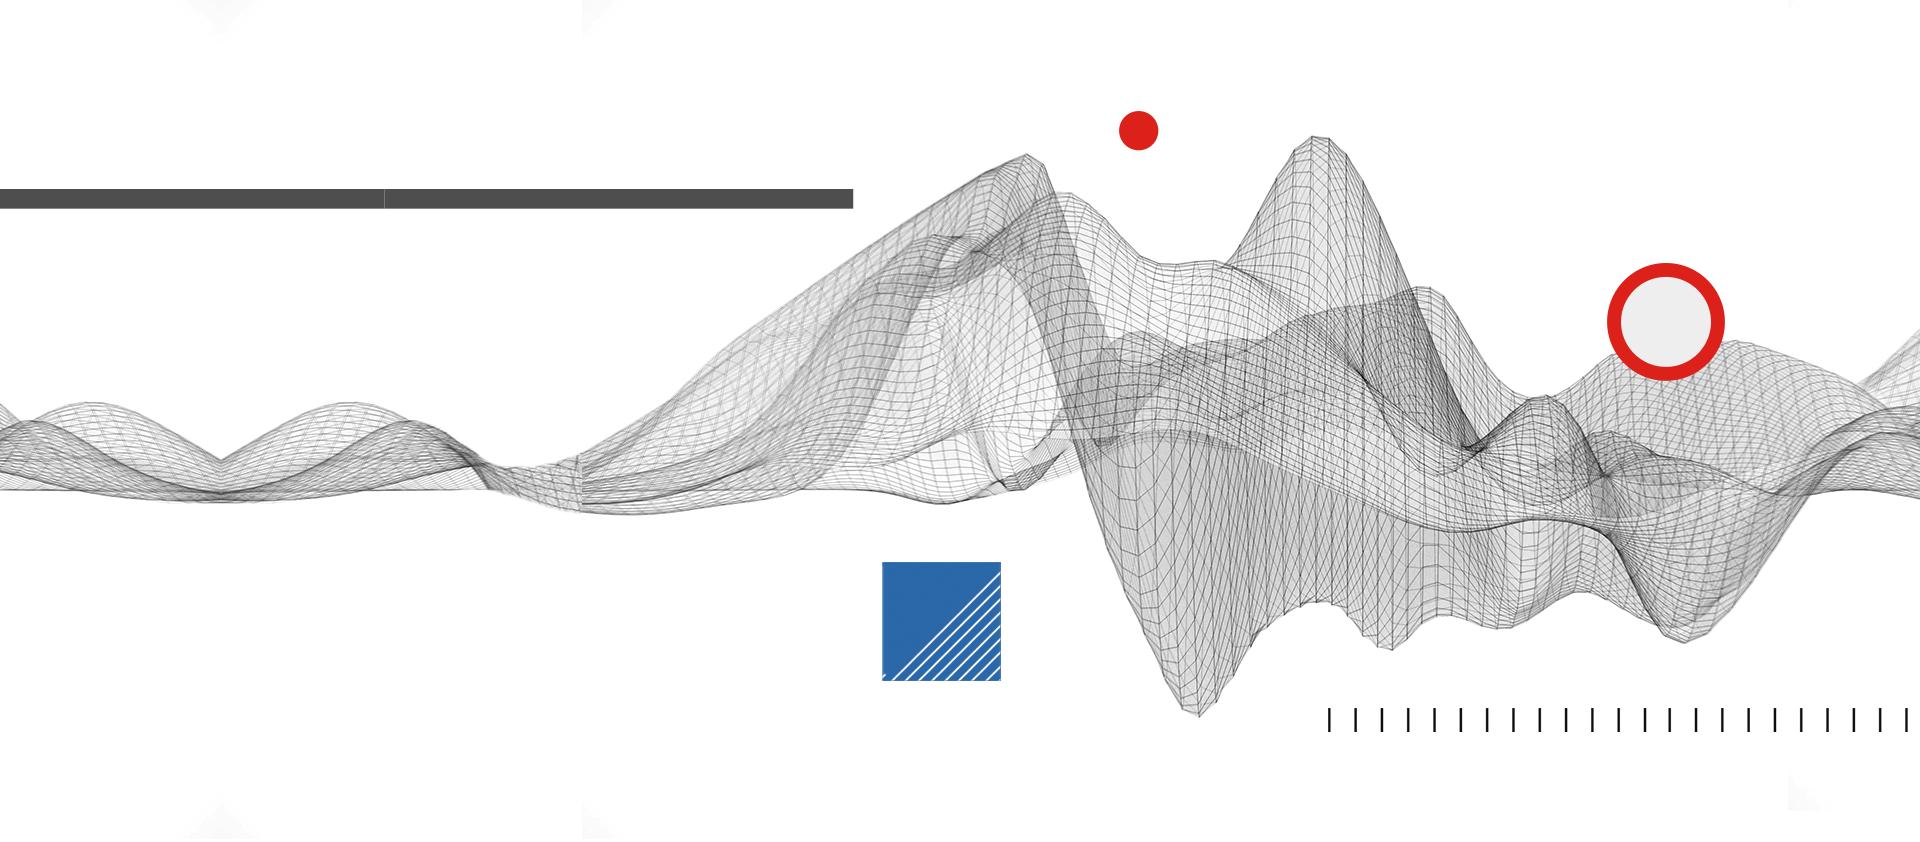 Abstract illustration representing data.